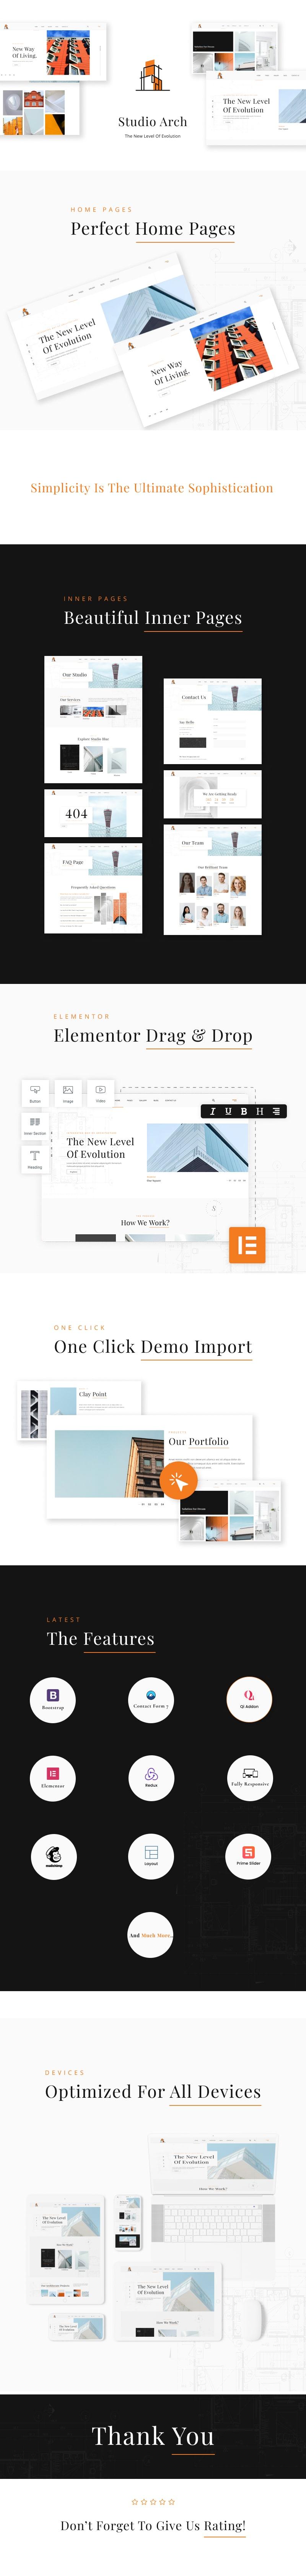 best free WordPress theme for Architects | Studio Arch | Iqonic Design best free wordpress theme for architects Studio Arch WordPress Long 20preview min